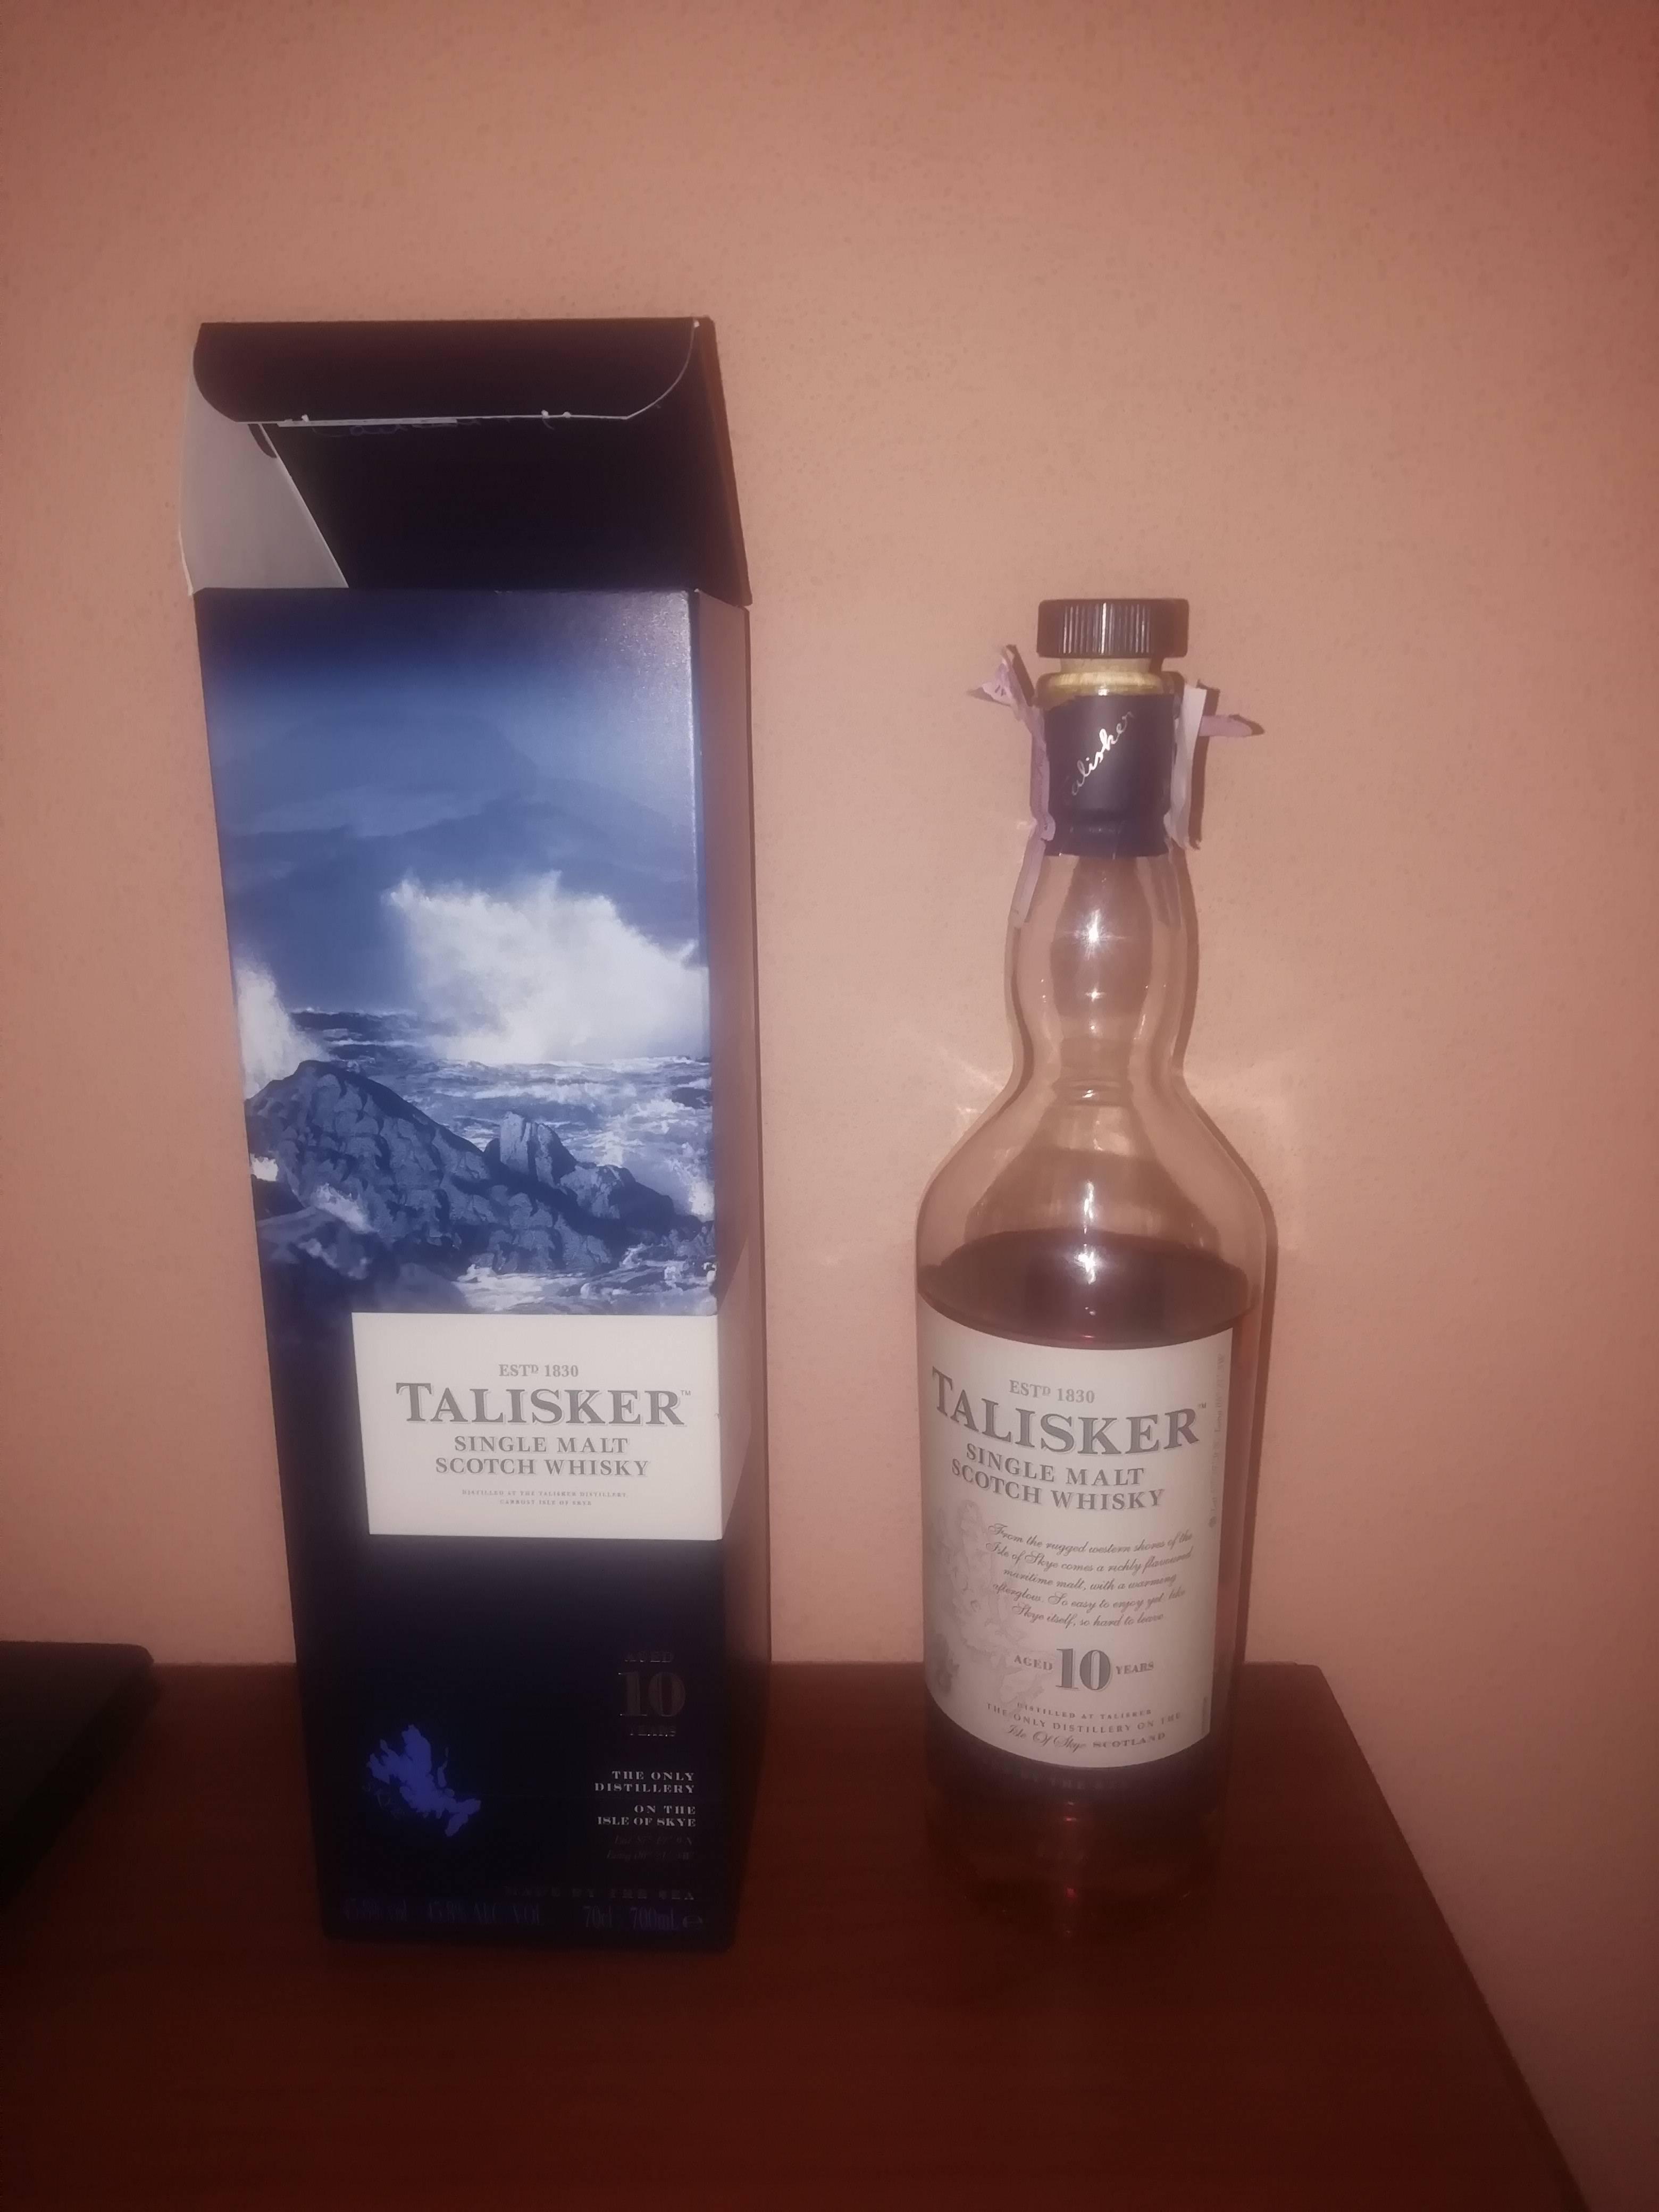 Виски талискер (talisker): история бренда и обзор коллекции напитков